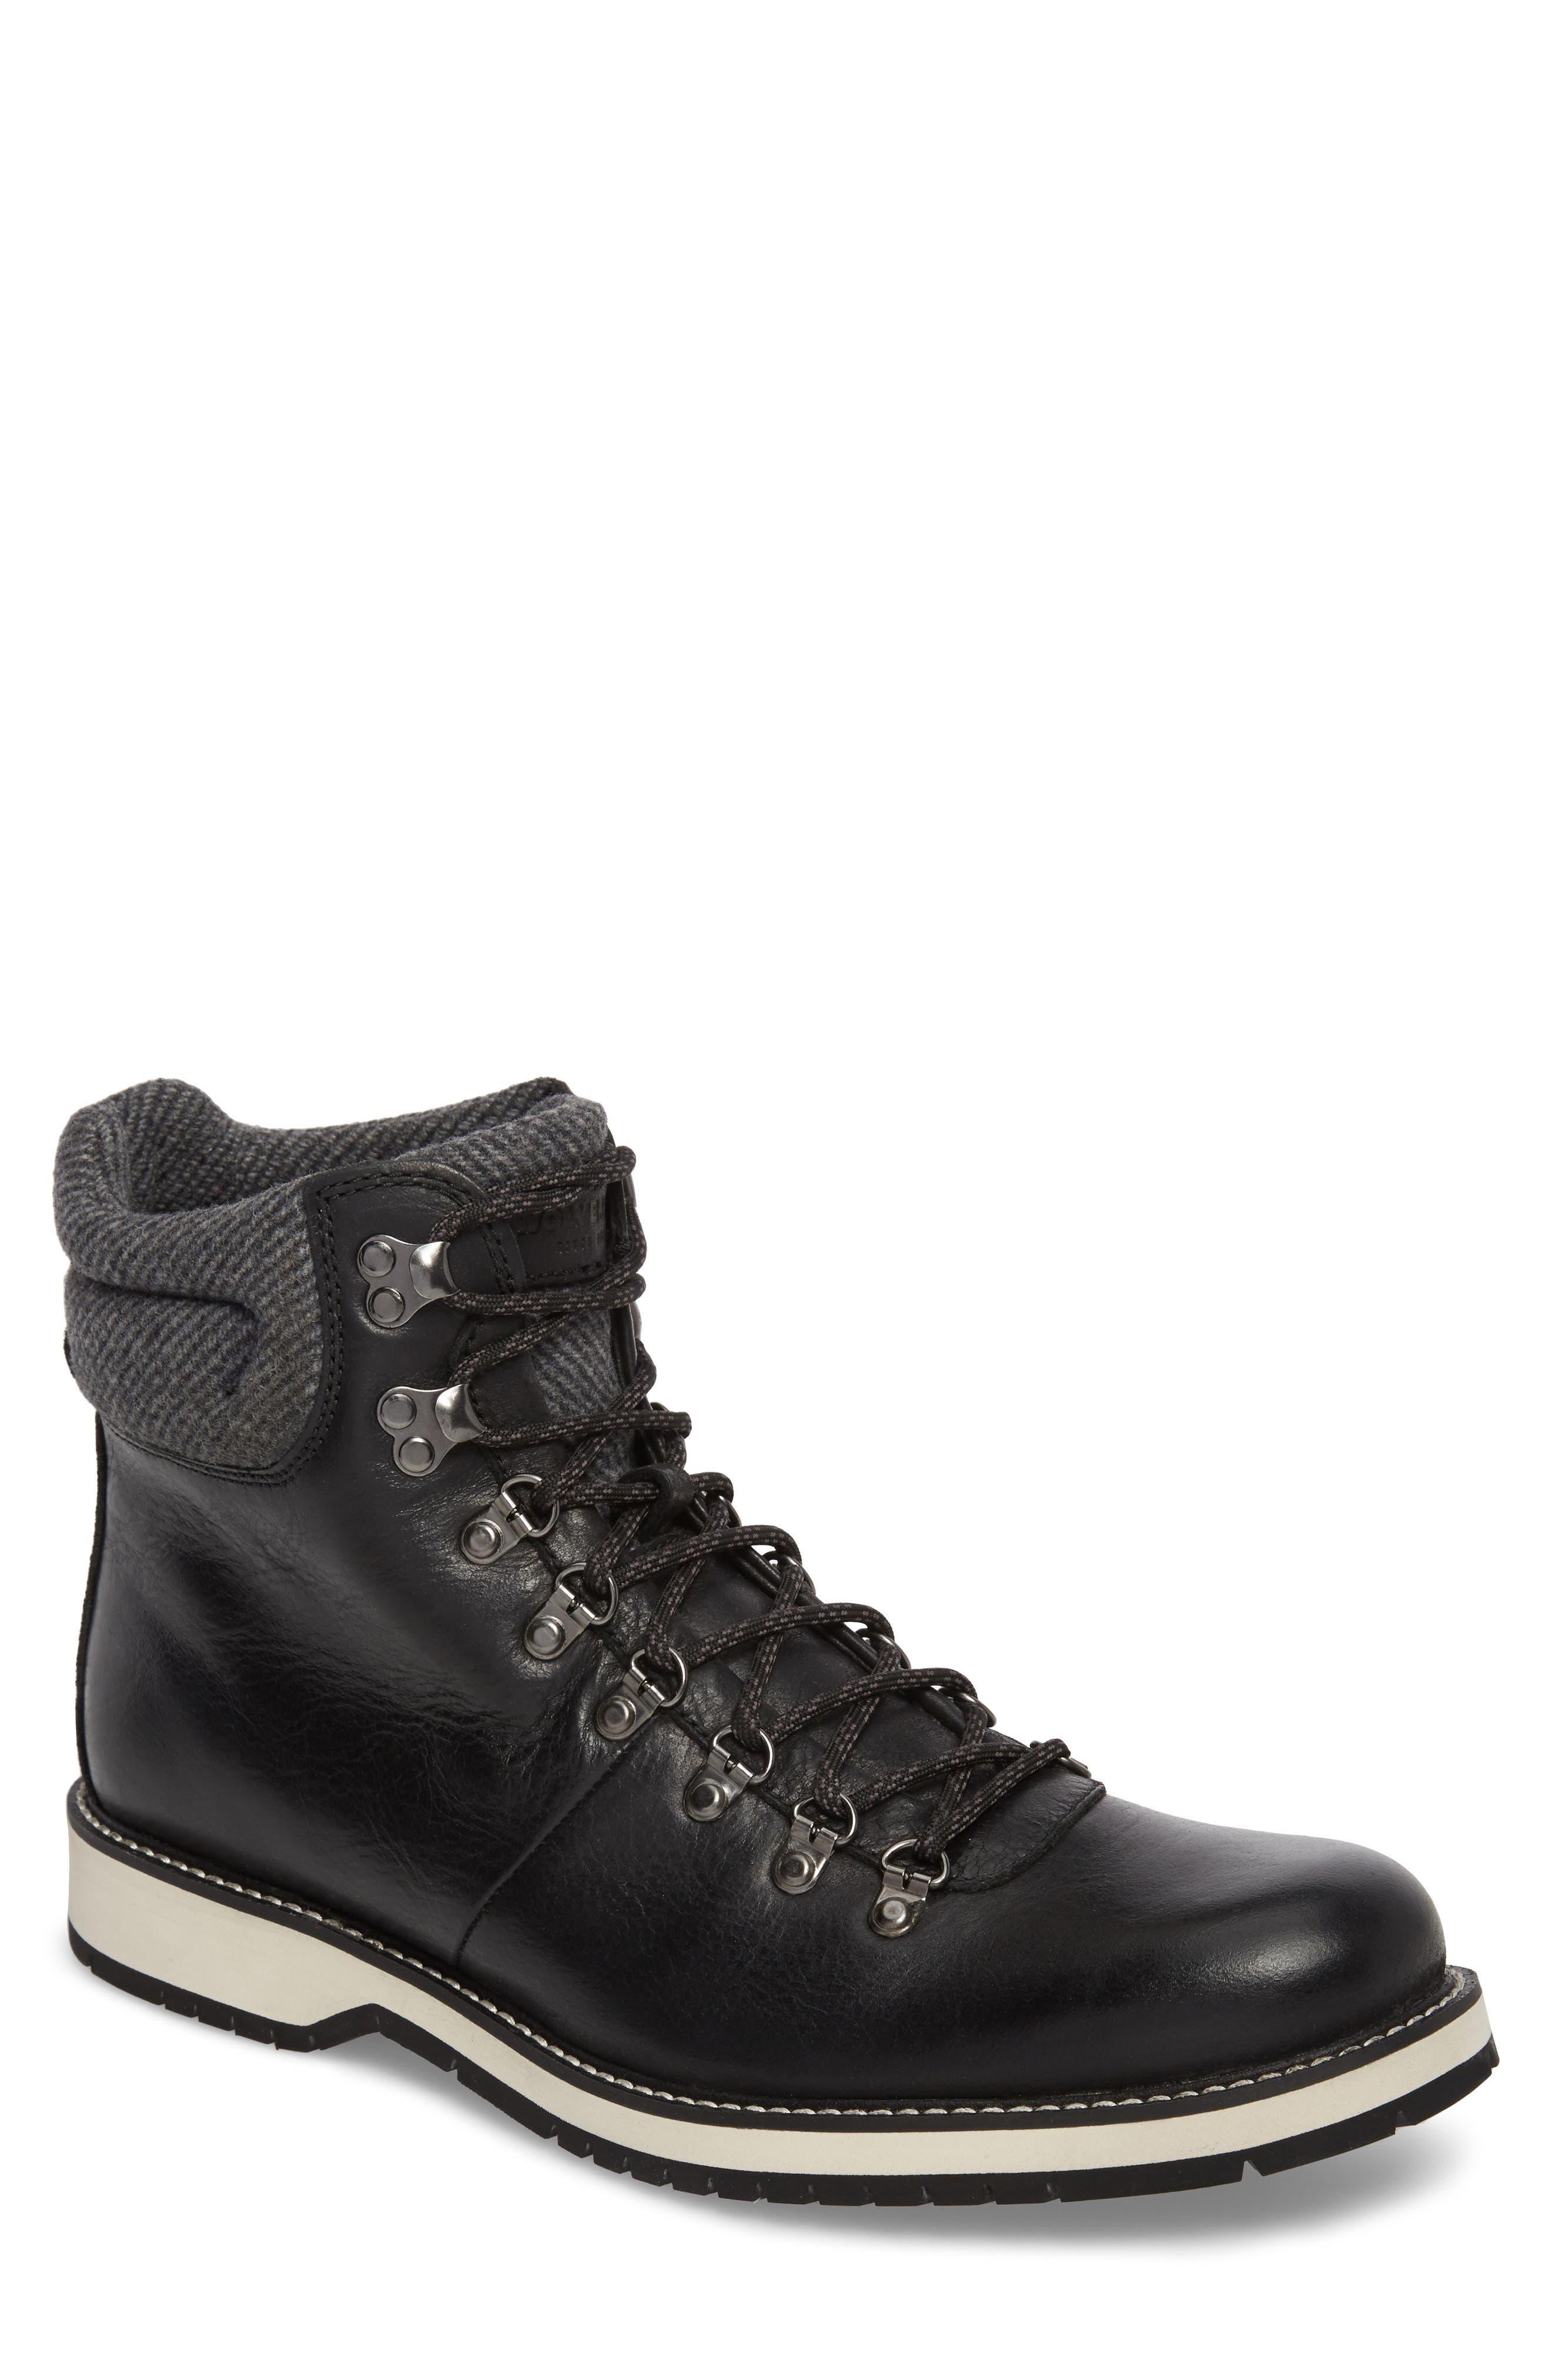 Sidney Waterproof Plain Toe Boot,                         Main,                         color, 001